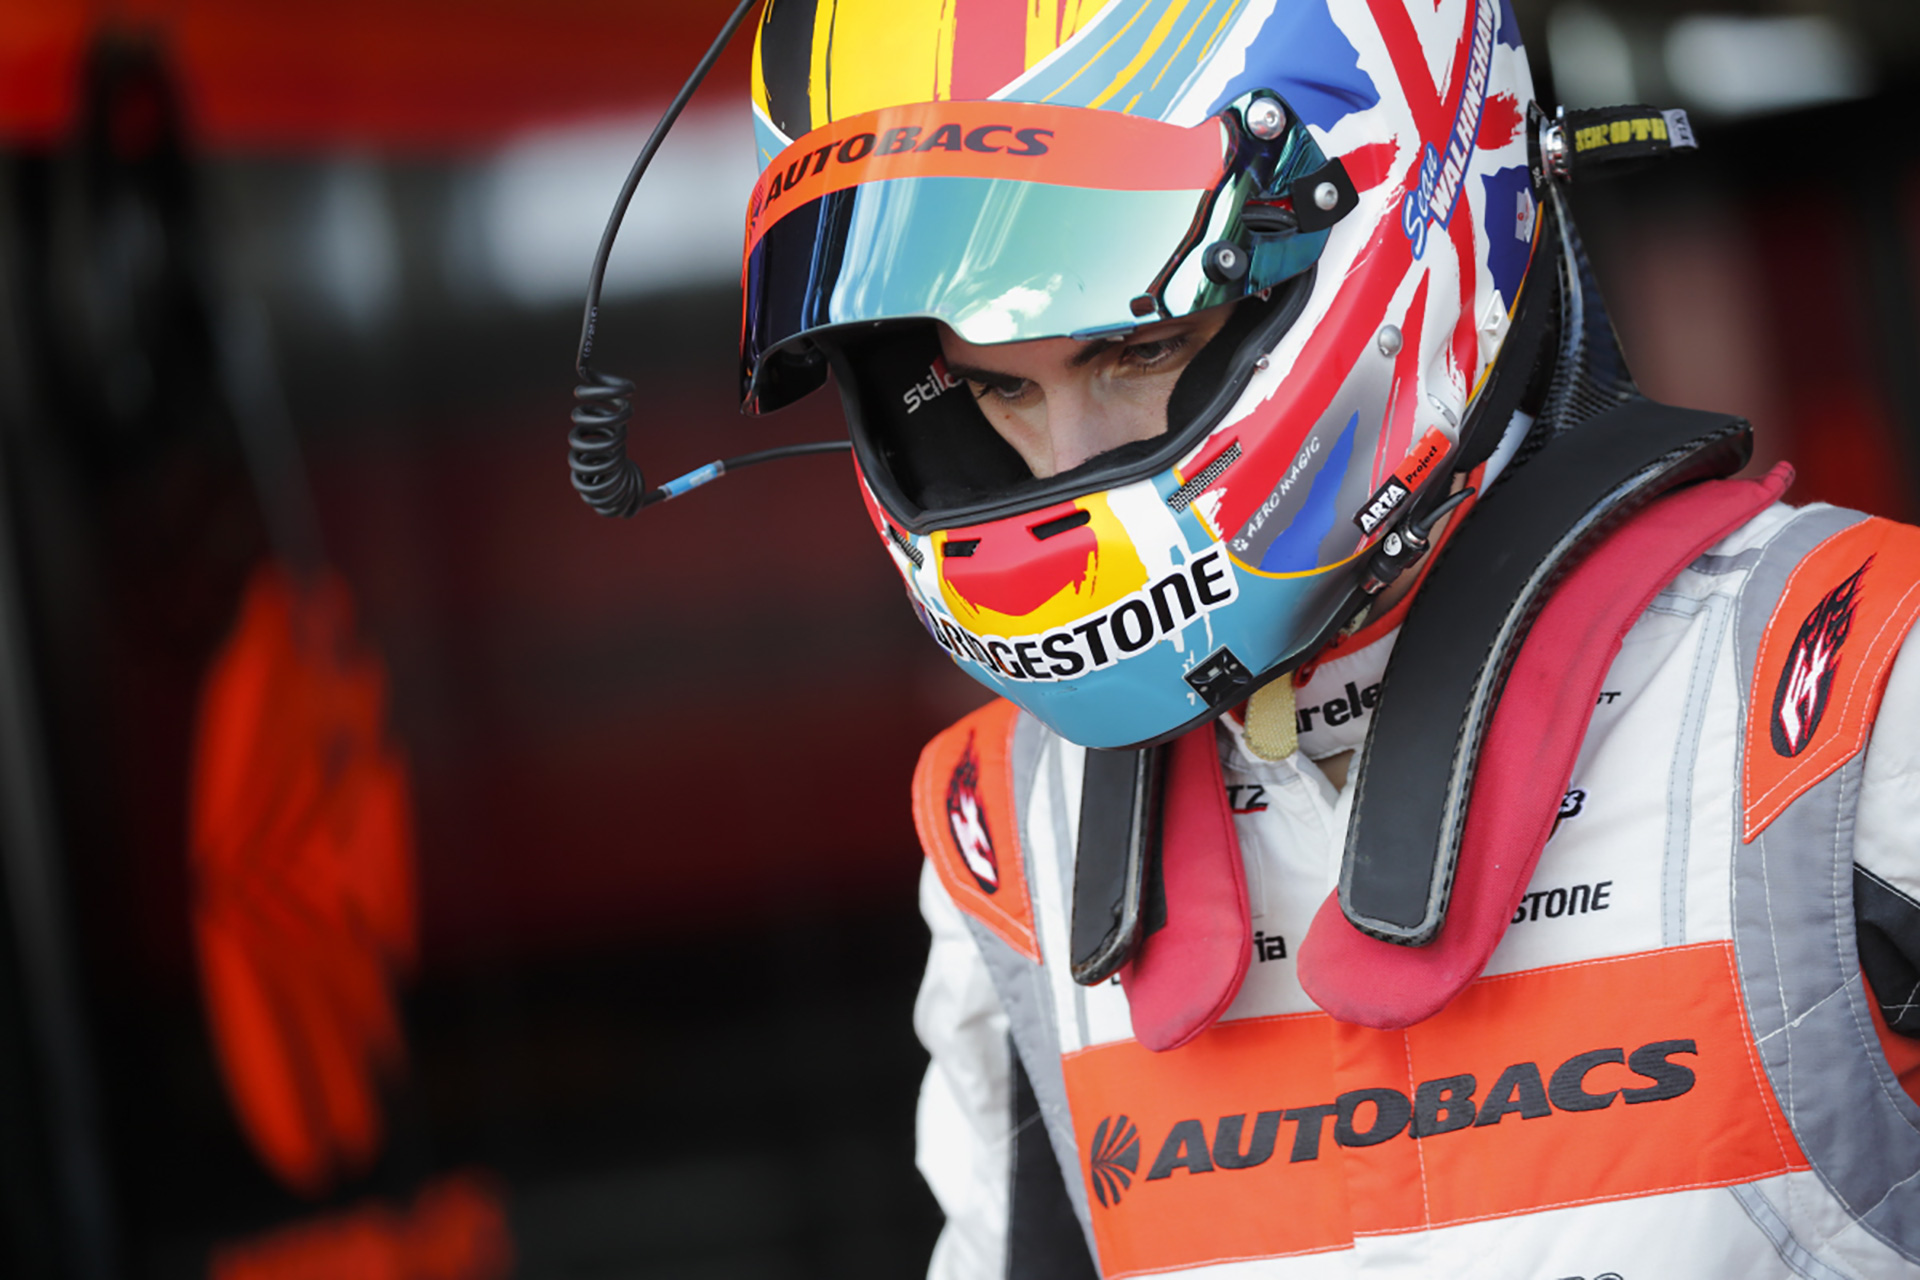 Super GT racer Sean Walkinshaw back for more in 2018.